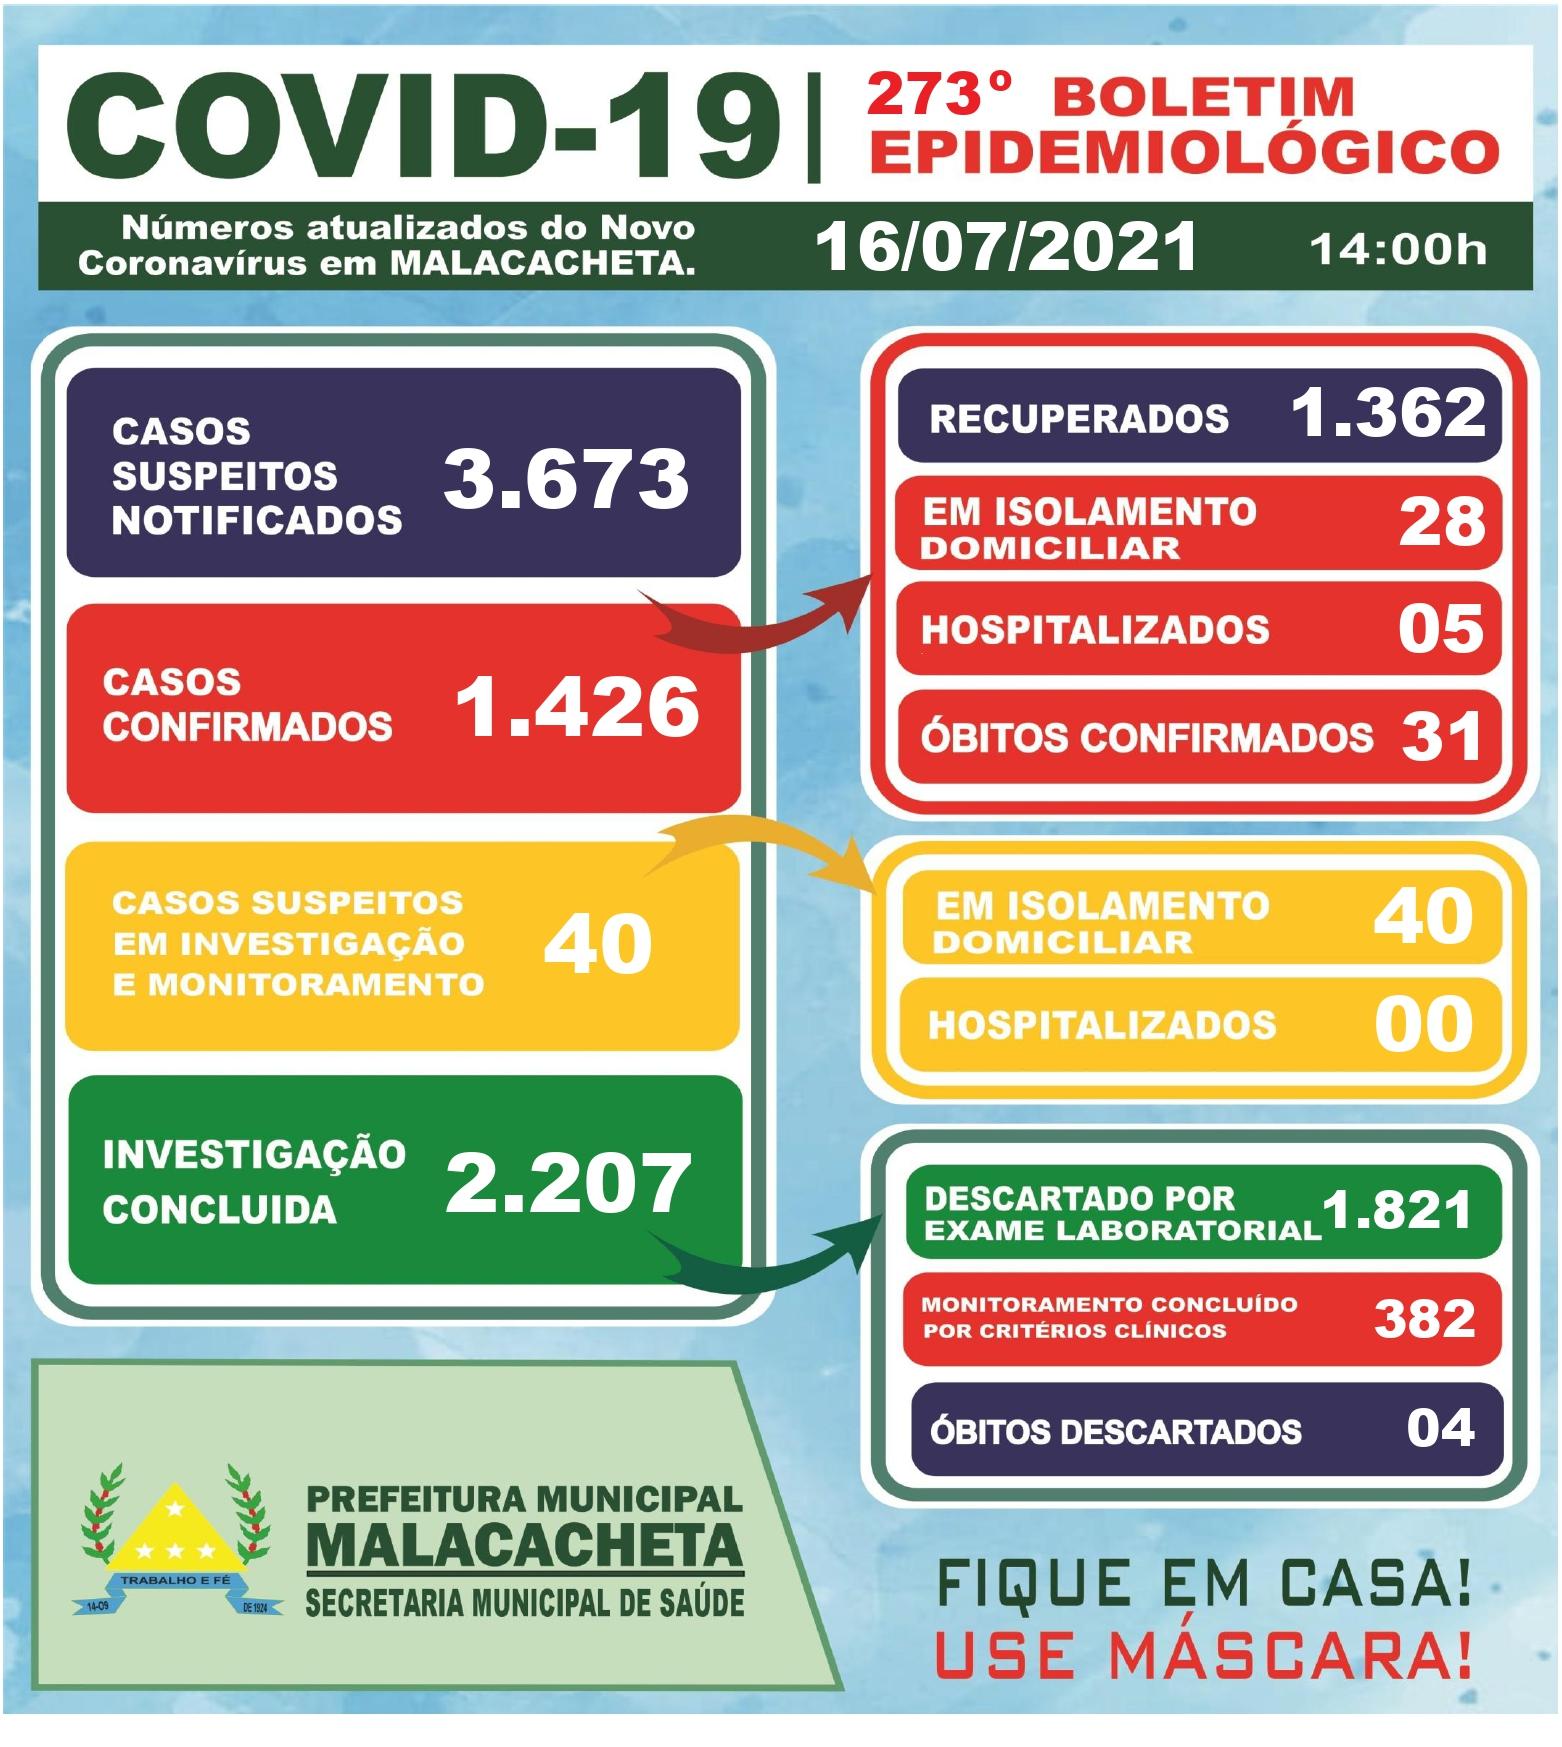 BOLETIM OFICIAL CORONAVÍRUS 16 DE JULHO DE 2021